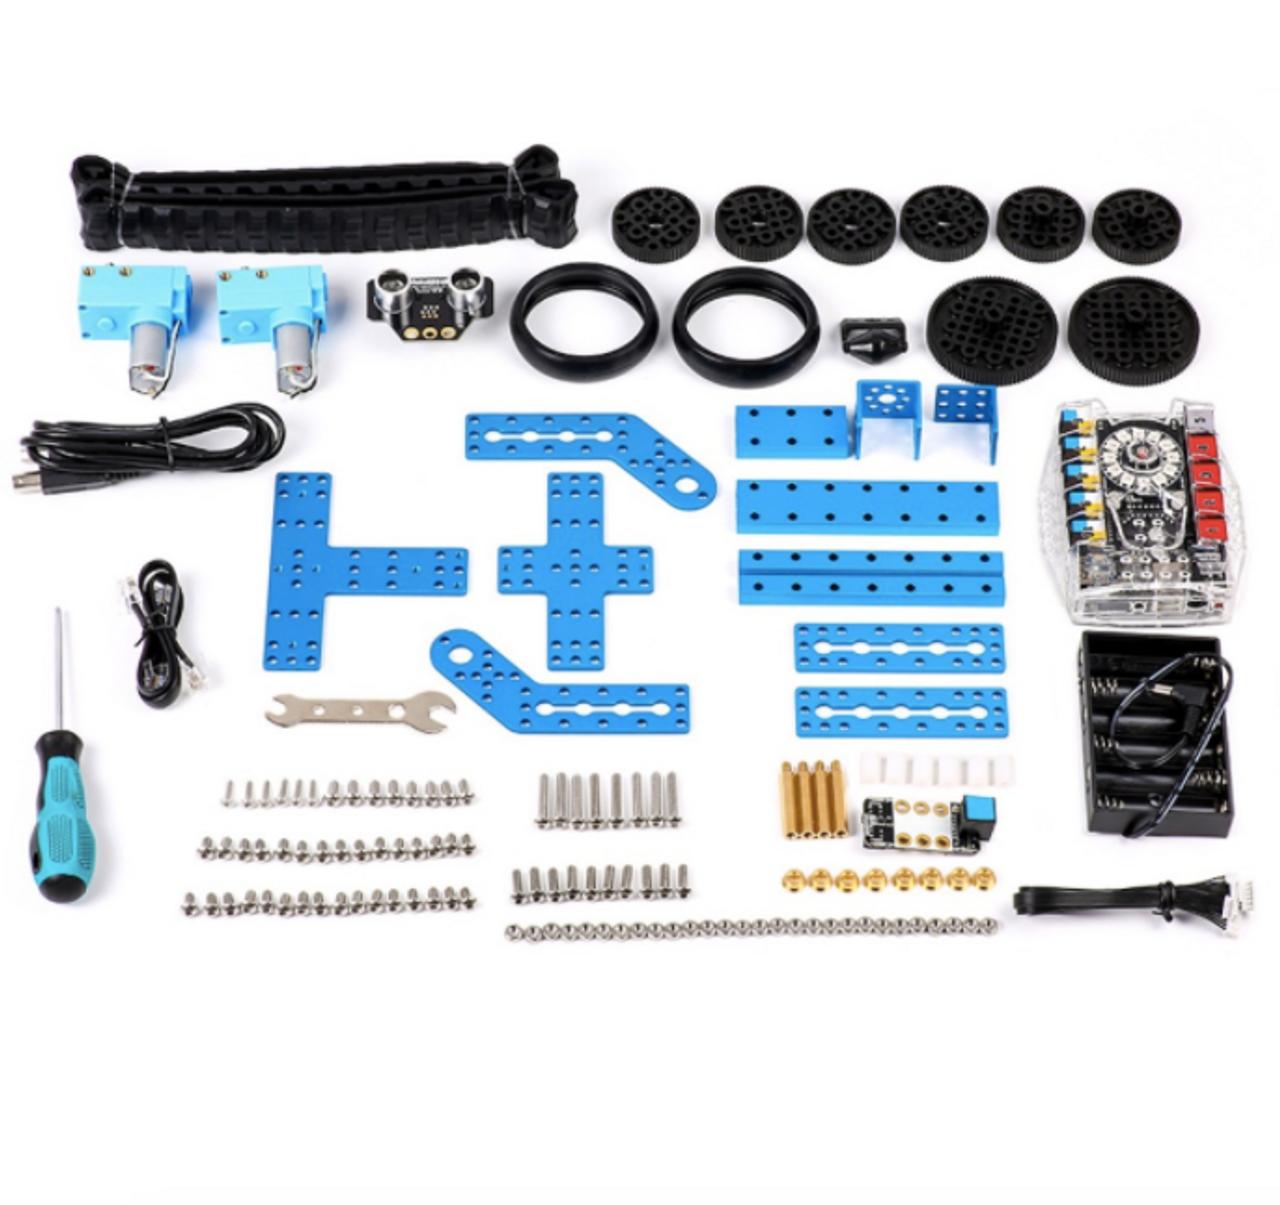 Makeblock mBot Ranger - STEM 3-in-1 Educational Robot Kit - Bluetooth